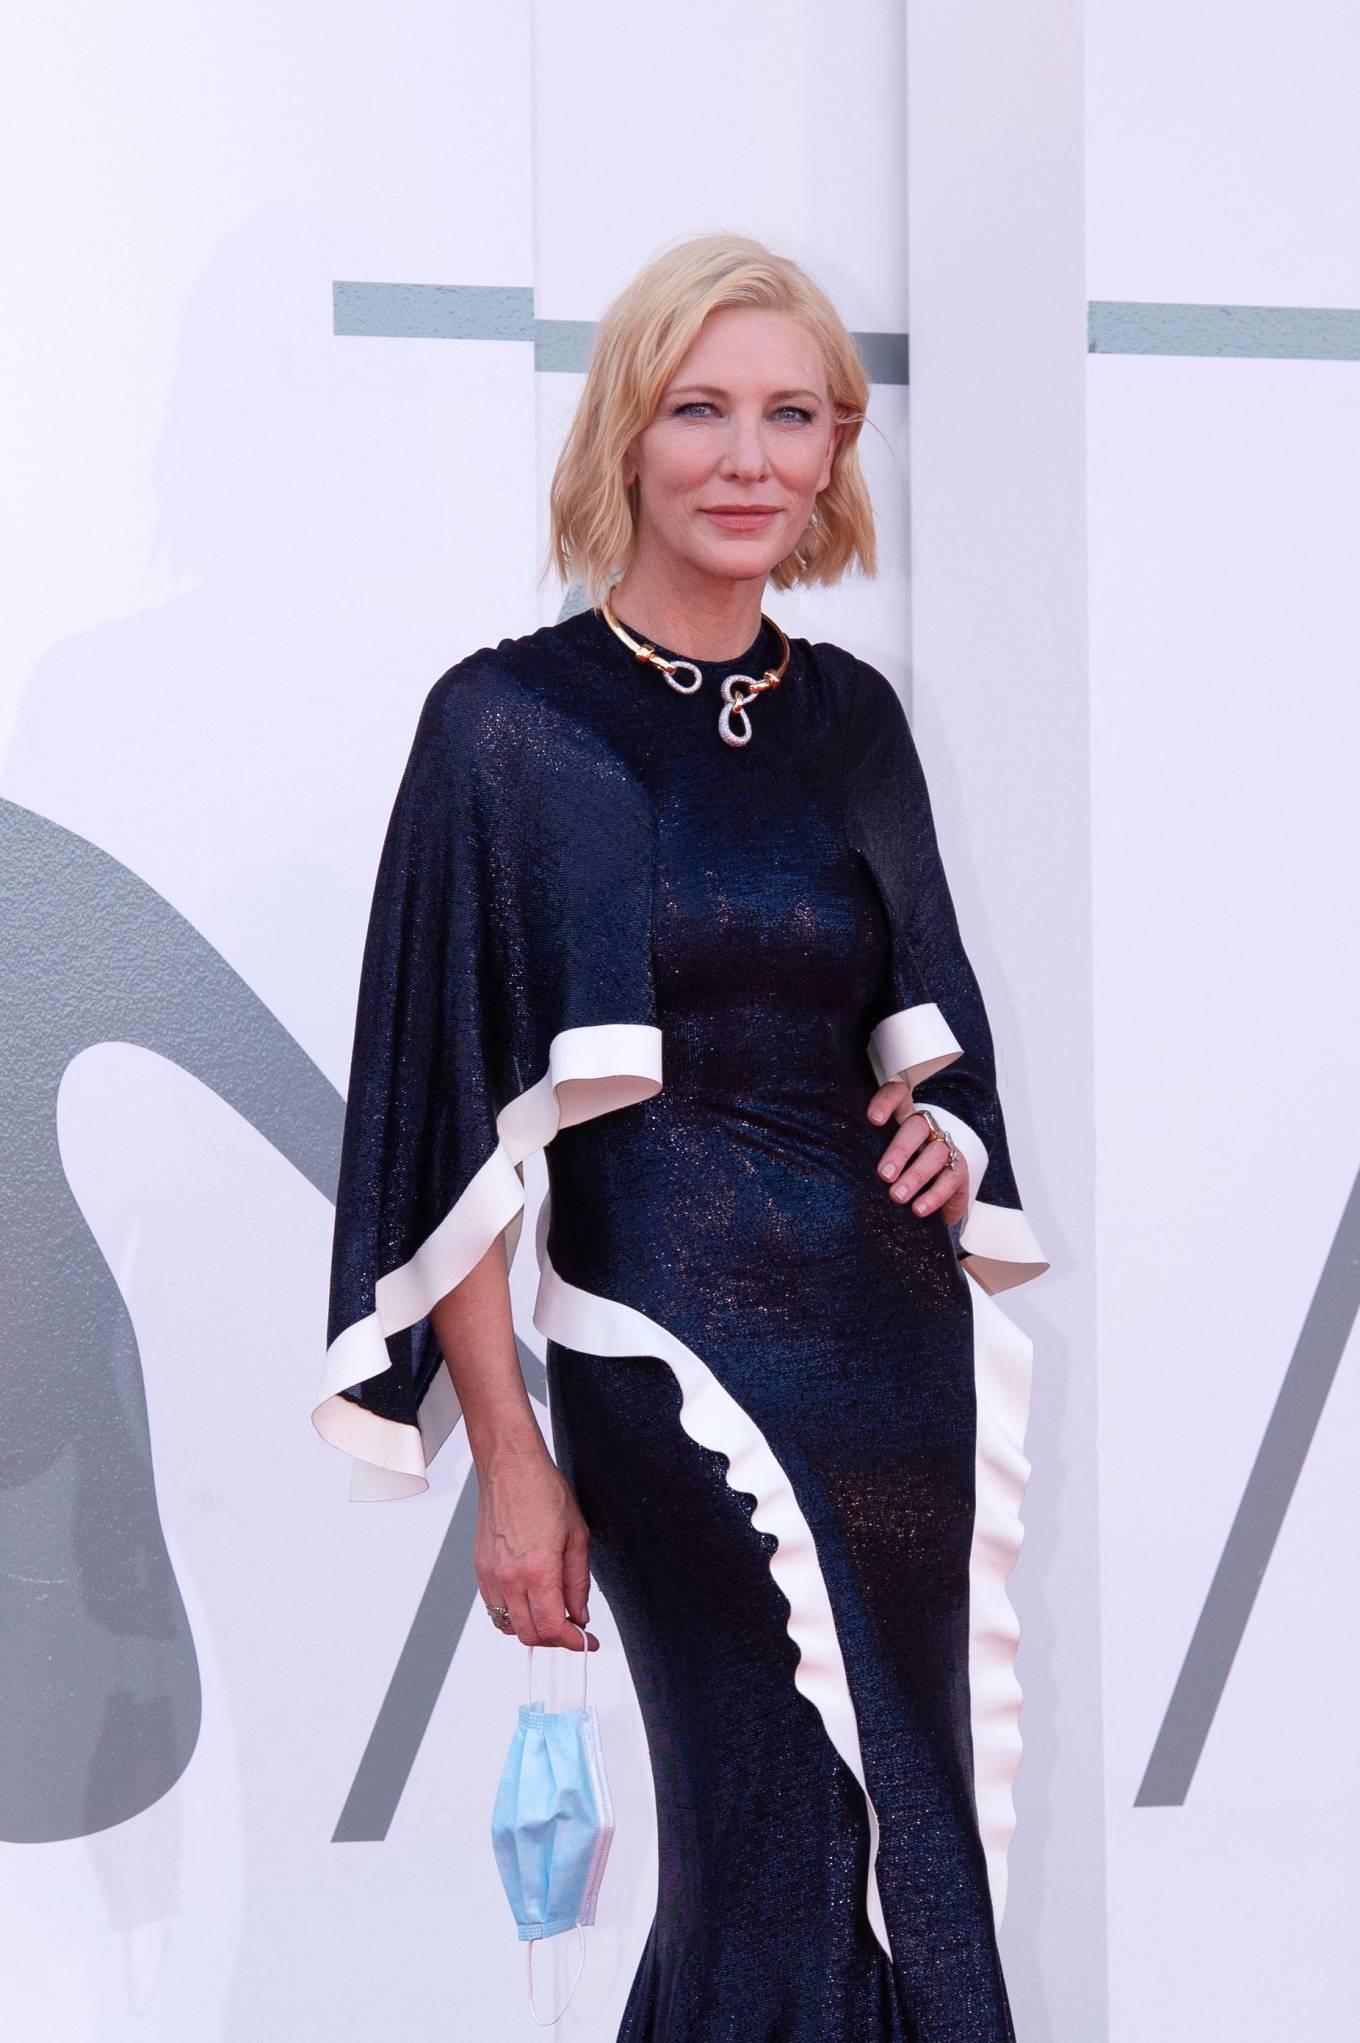 Cate Blanchett 2020 : Cate Blanchett attending Opening Ceremony at 2020 Venice International Film Festival – Italy-18